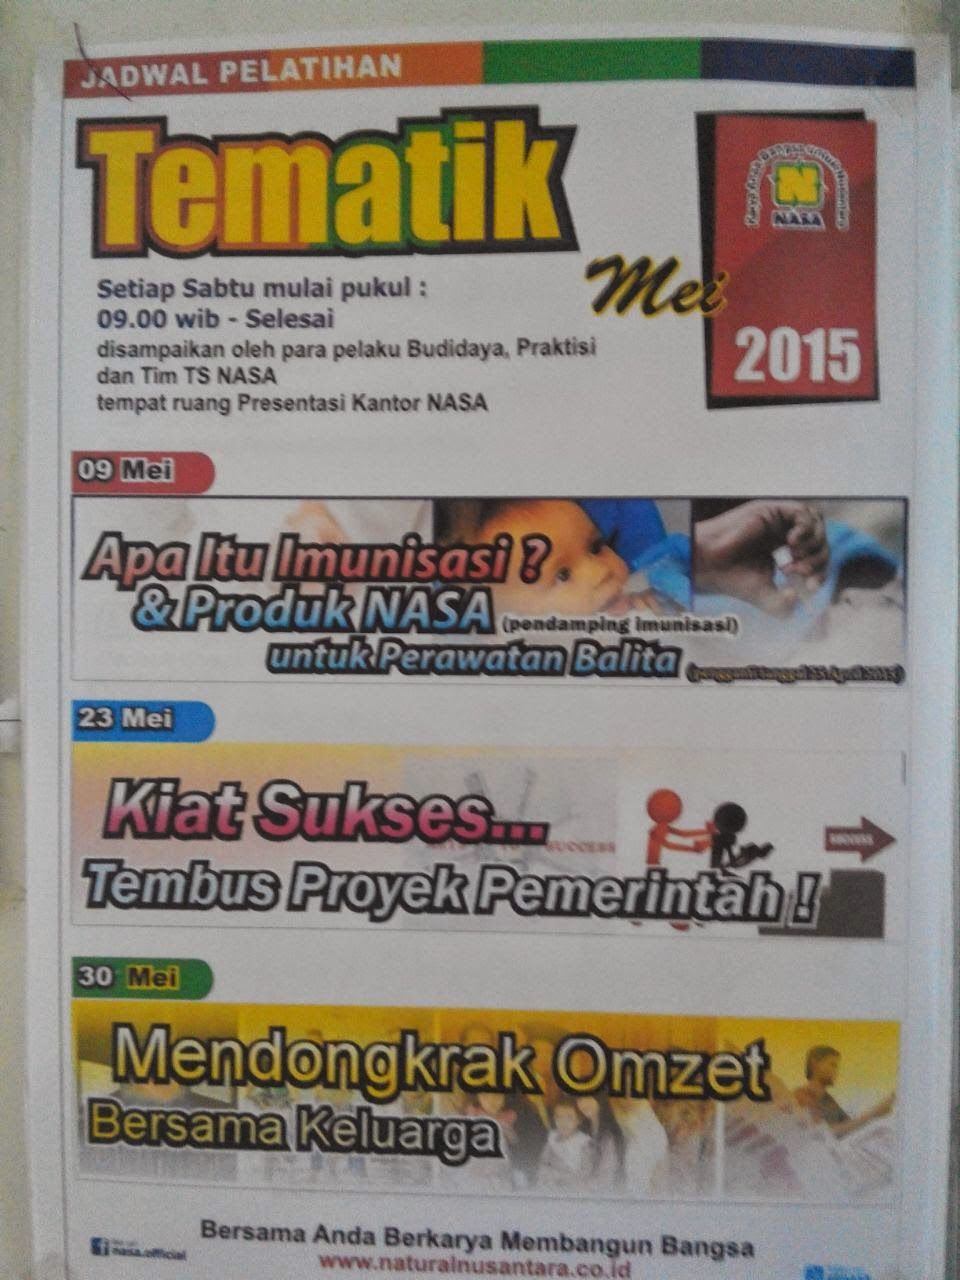 http://www.stockistnasajogja.com/2015/04/jadwal-pelatihan-tematik-periode-mei.html